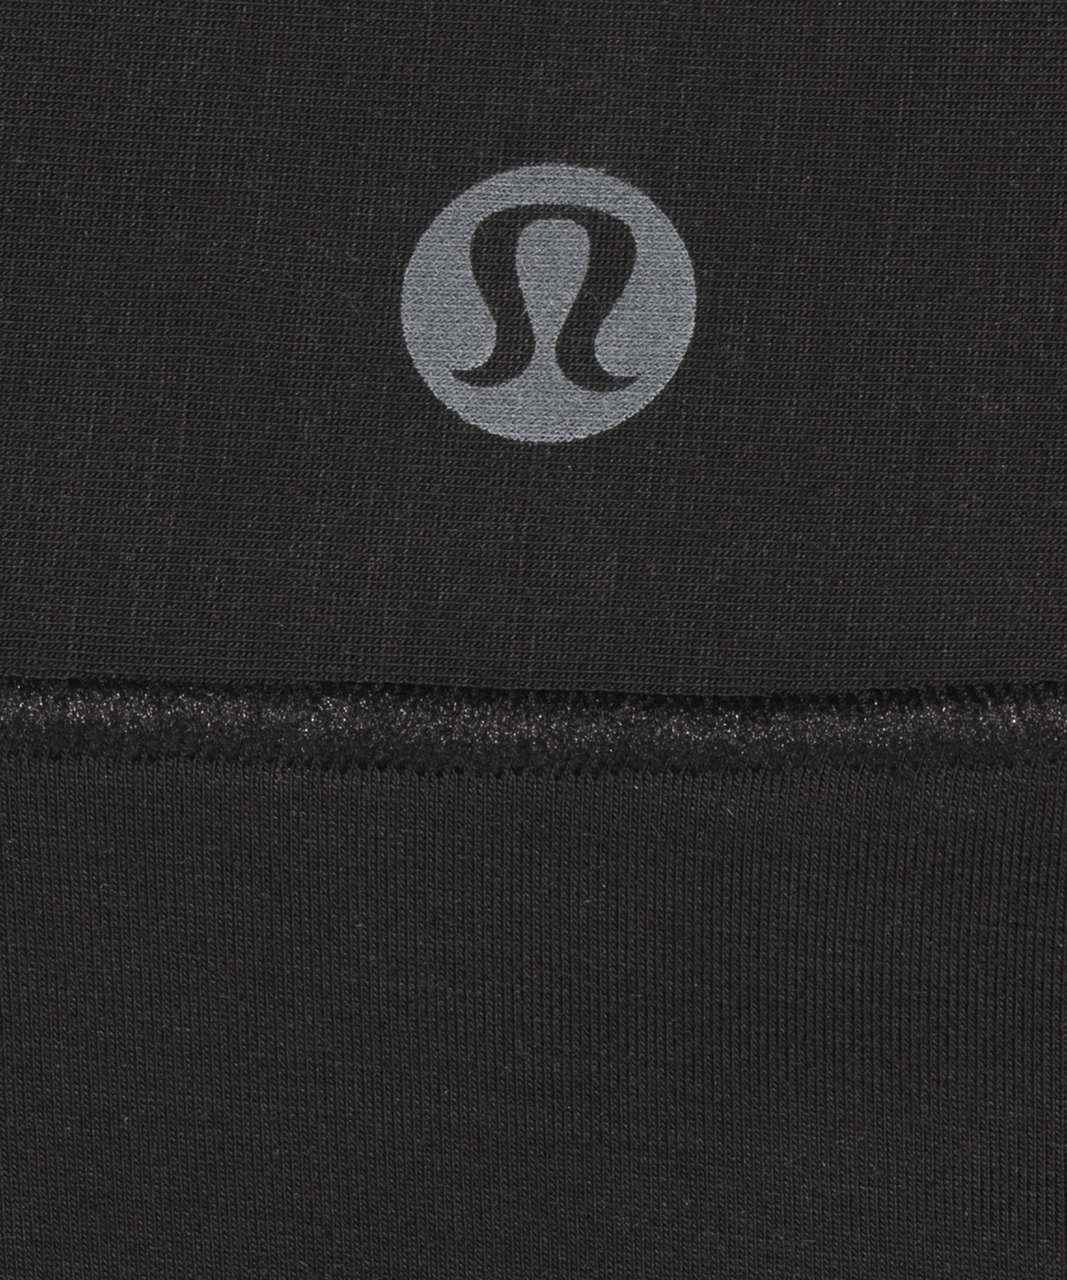 Lululemon UnderEase Mid Rise Thong Underwear 3 Pack - Black